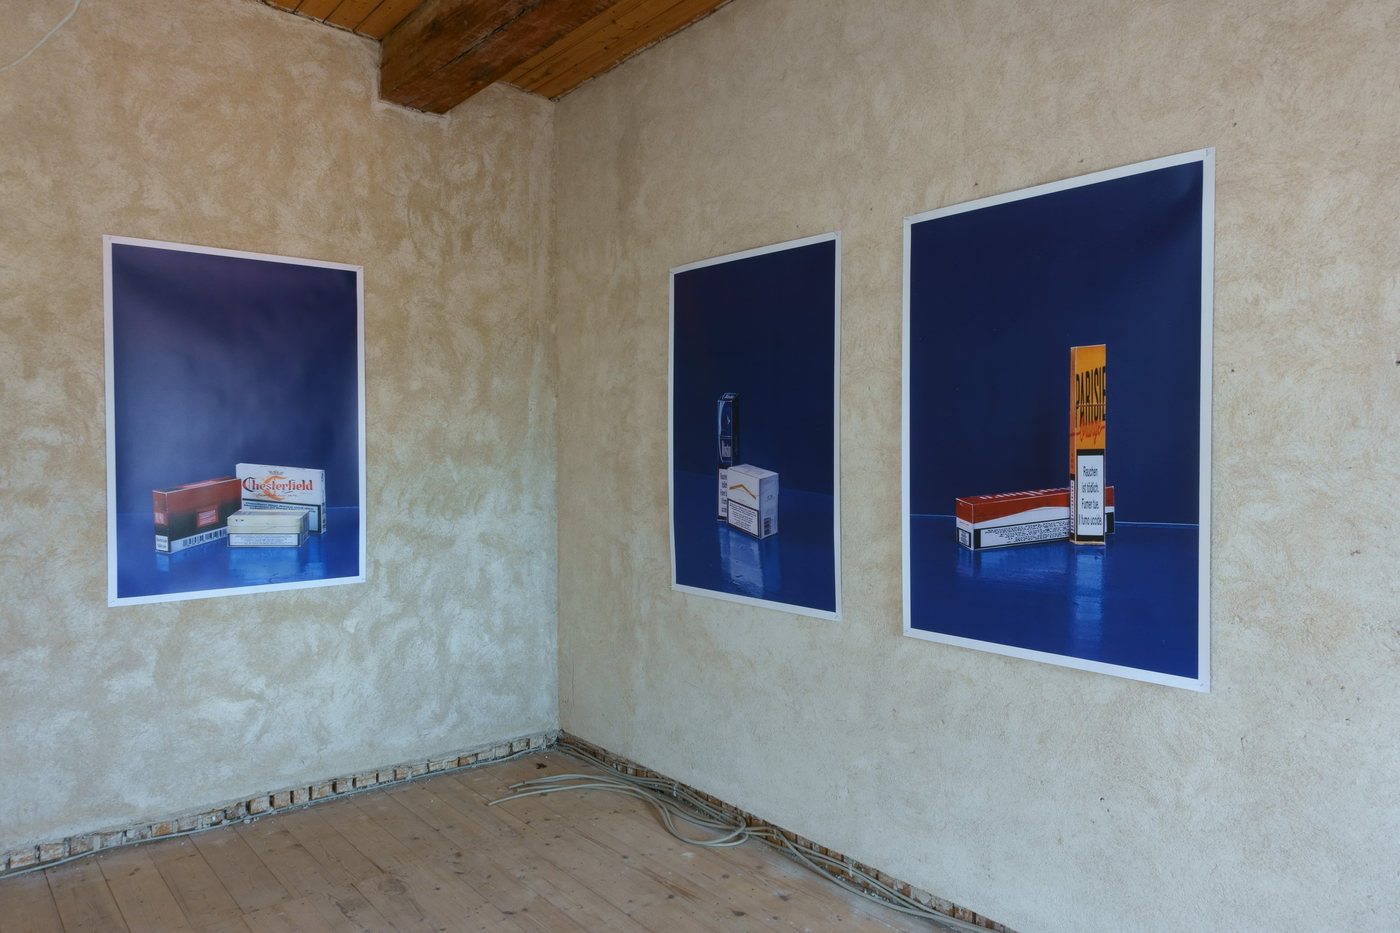 Kunstverein Wiesen_KuWi_Forward to History_Jan Kiefer & Robert Brambora_2016_JK_Room3_a